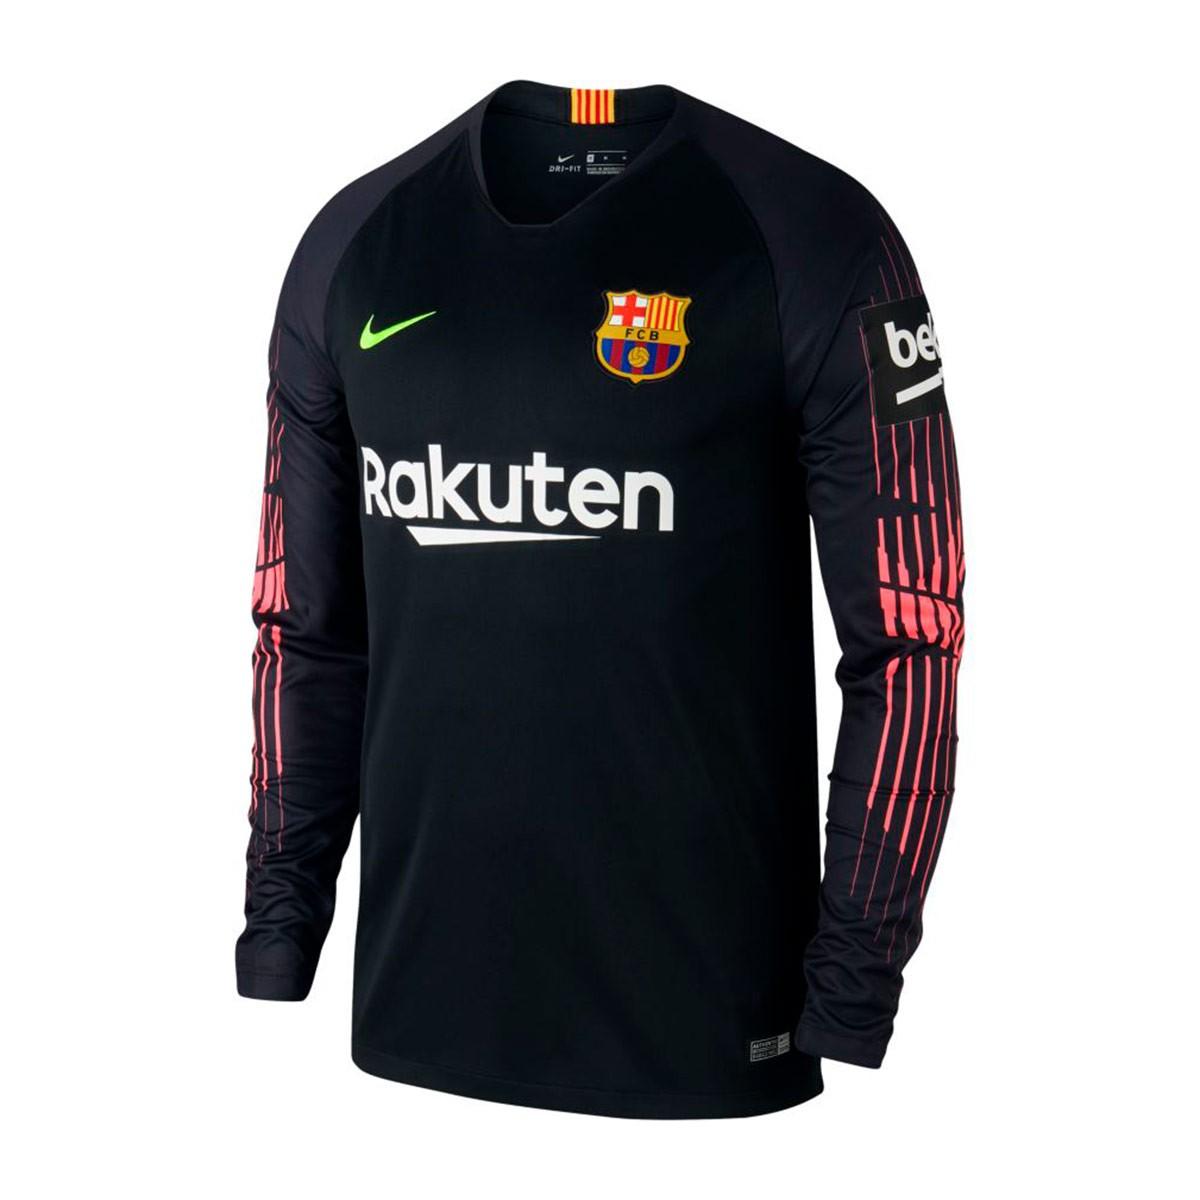 225e0fd5041c2 Jersey Nike Goalkeeper FC Barcelona Stadium 2018-2019 Black-Volt ...